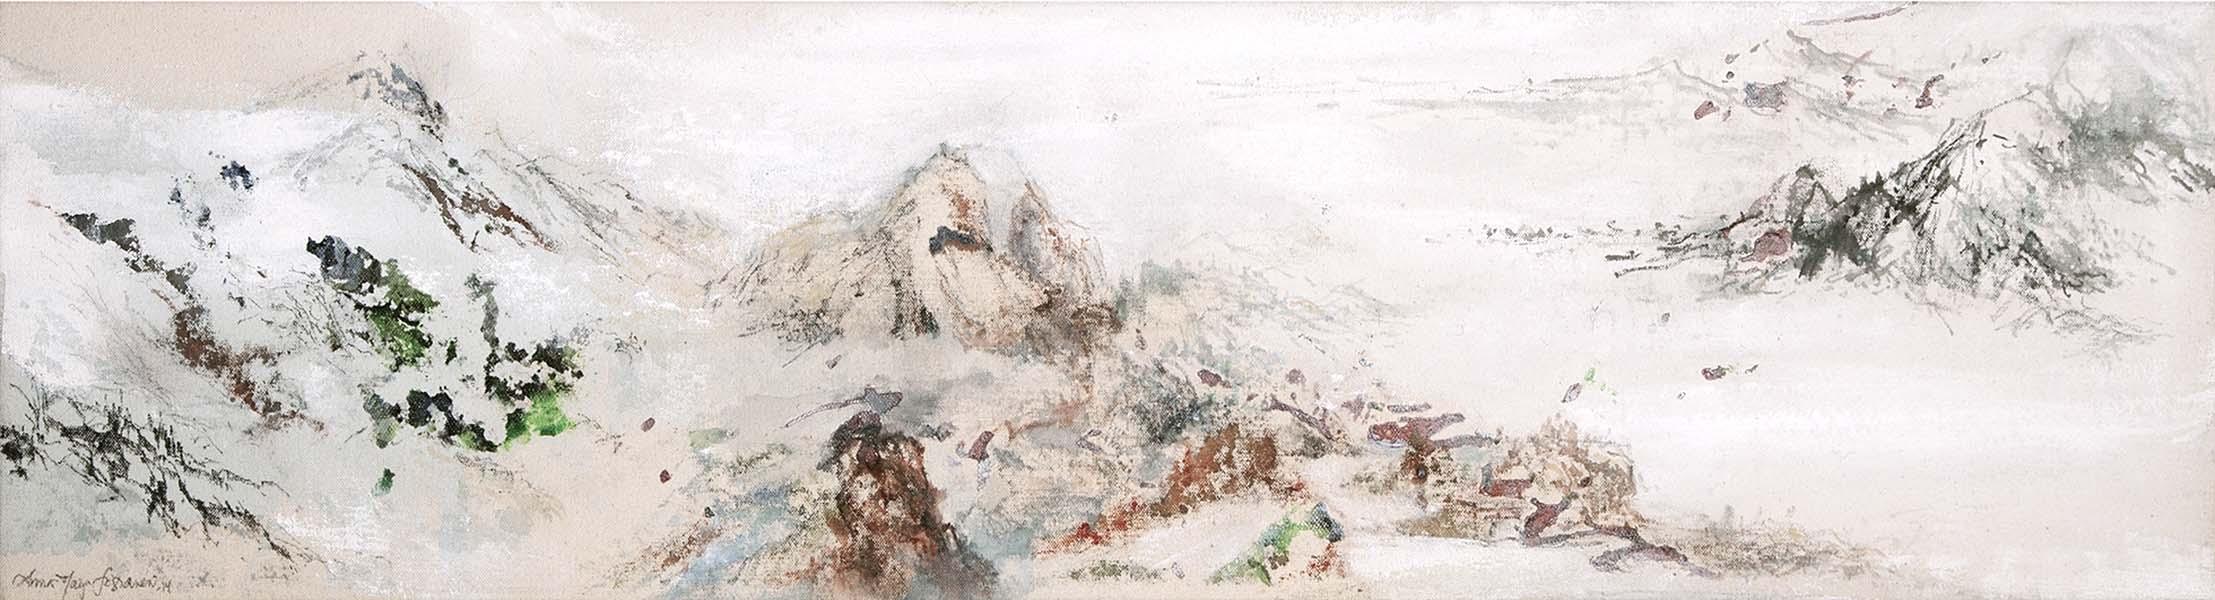 Mixed media on canvas, 20 x 75 cm, 2014